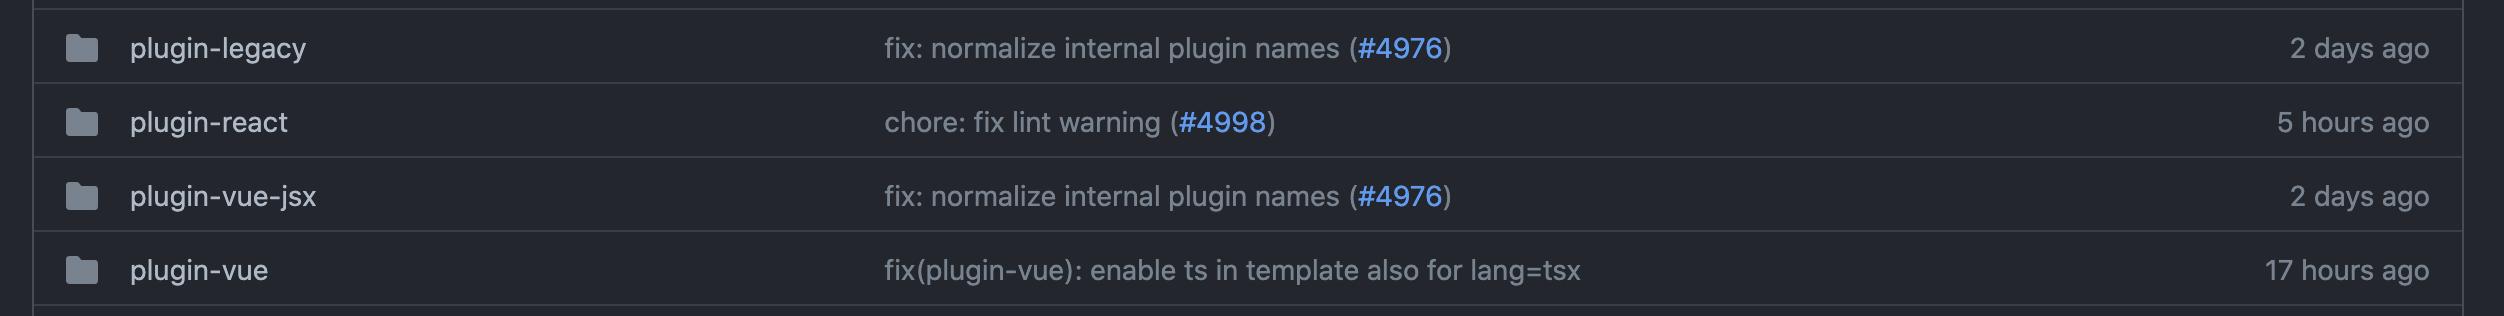 Various plugins